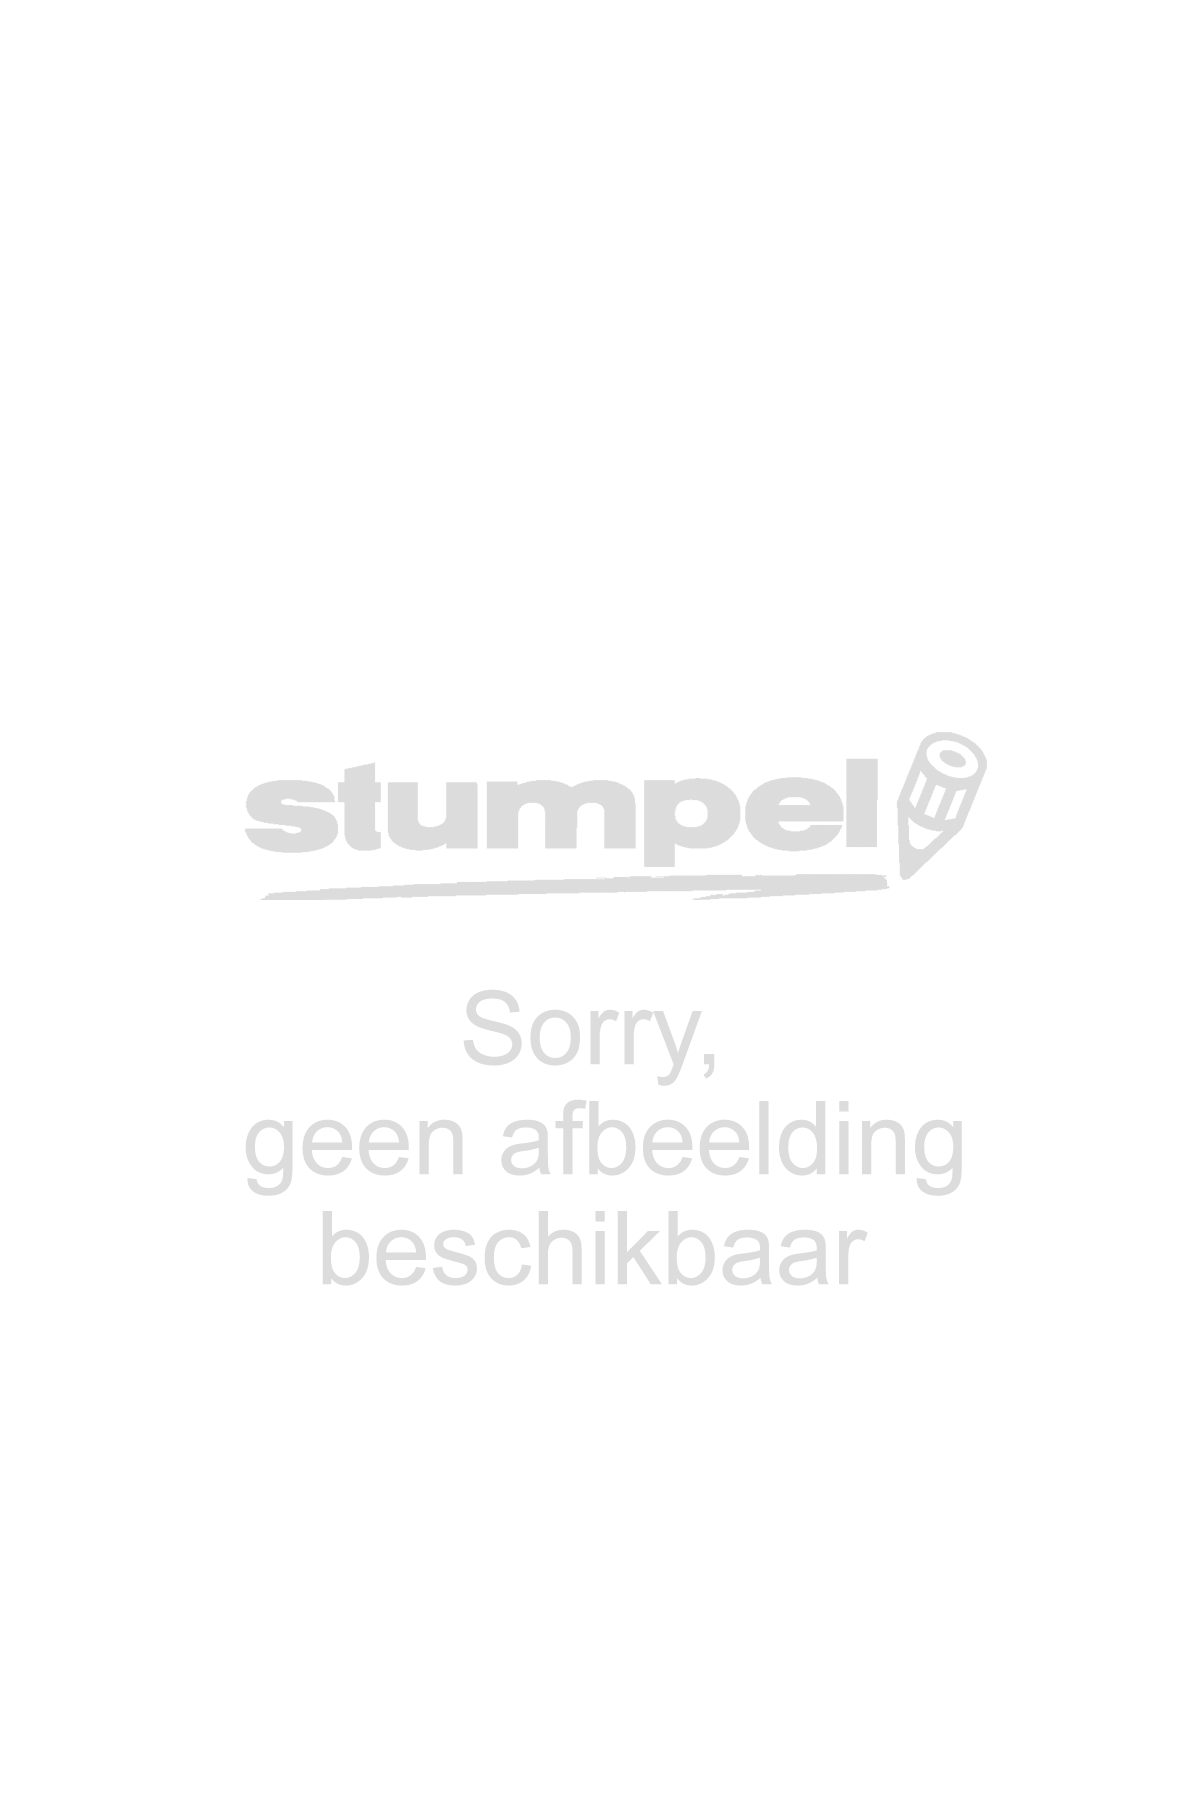 schrift-a6-pak-a3-colibri-stationary-paperclip-10804100